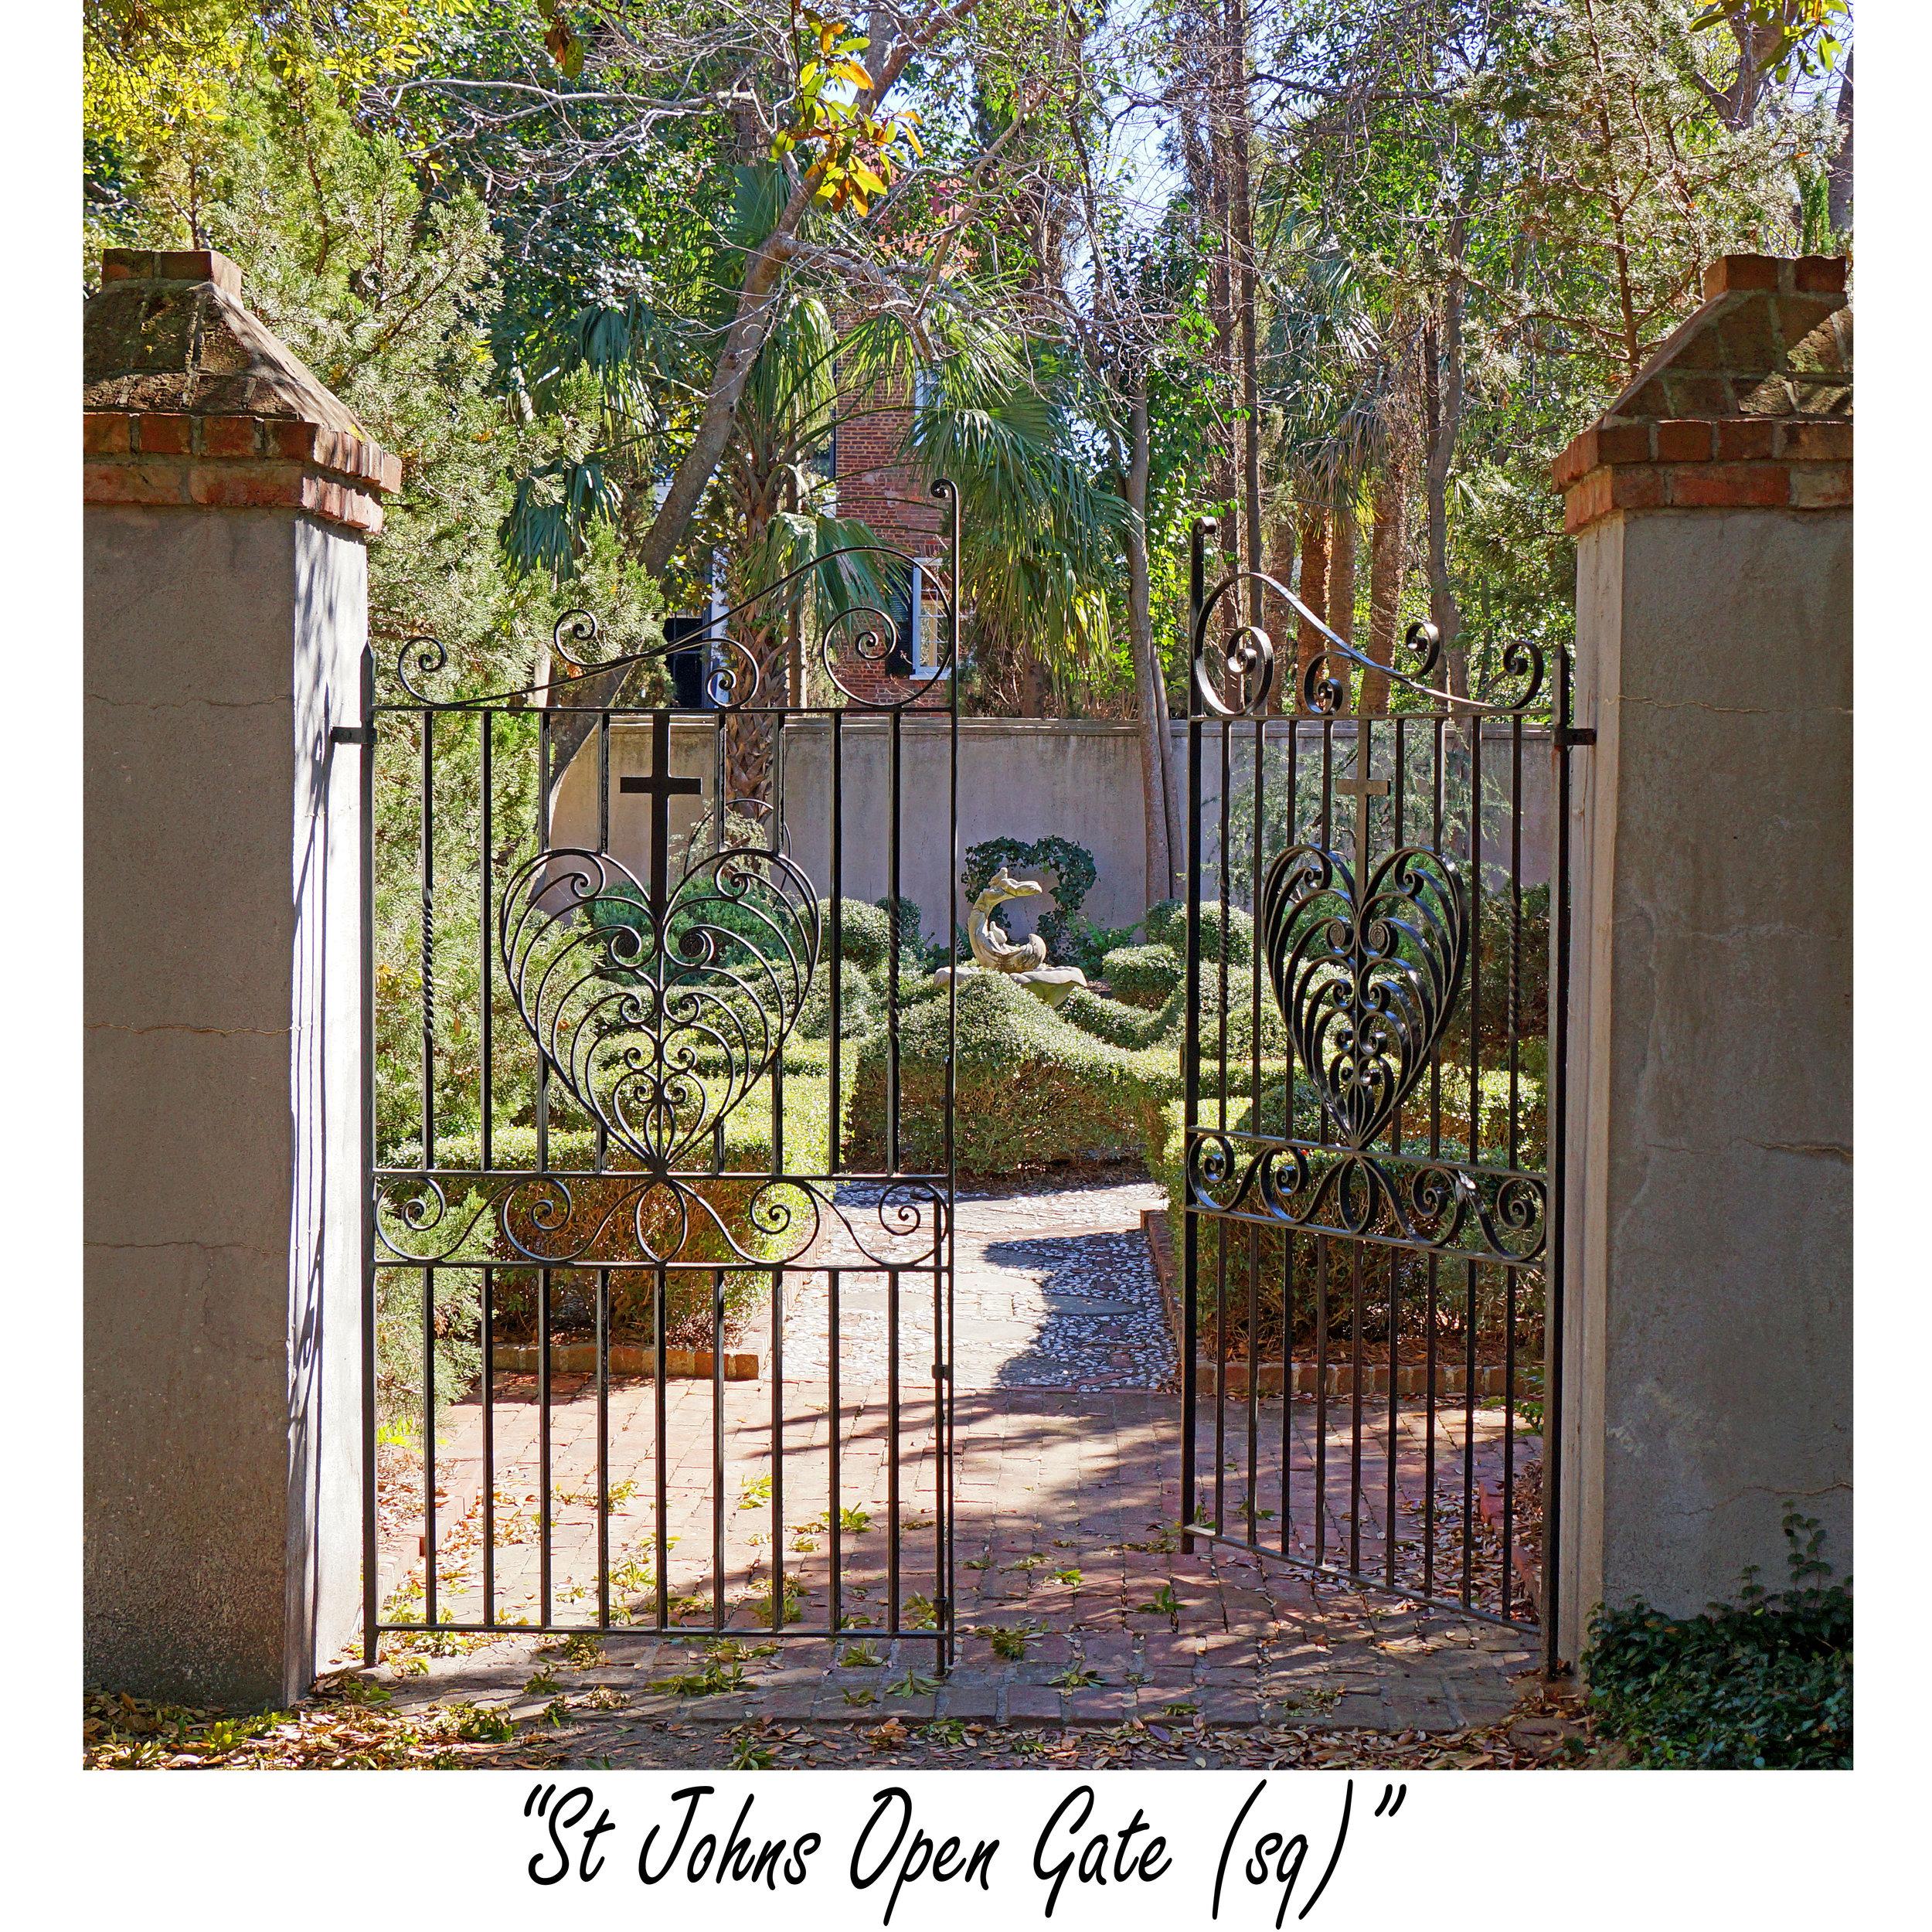 St Johns Open Gate (sq).jpg